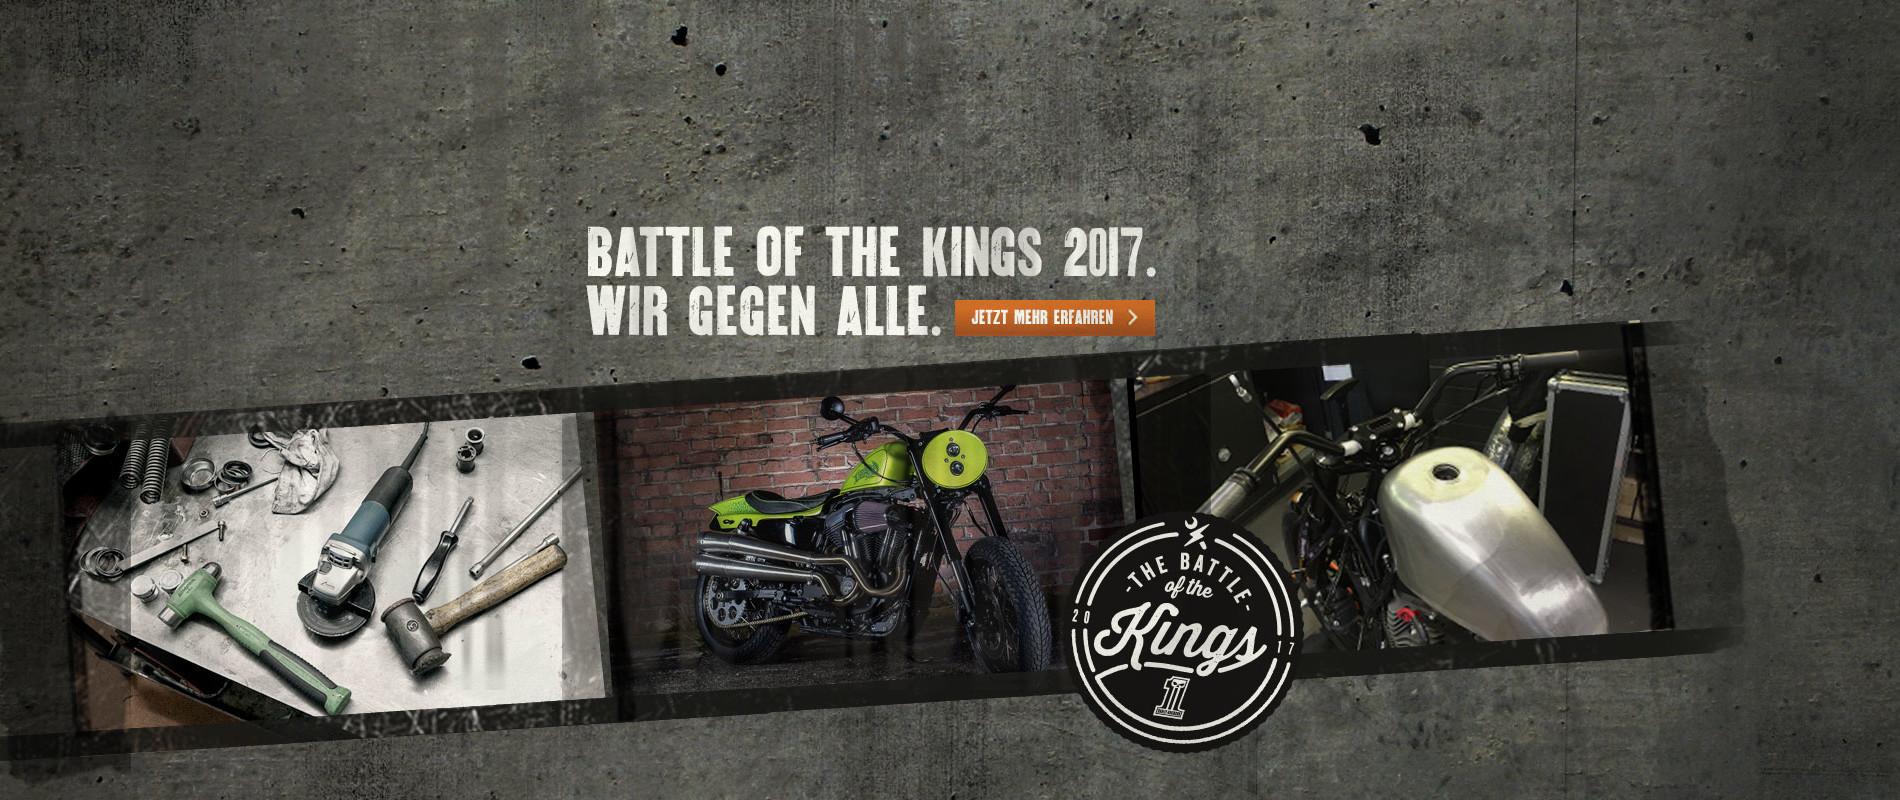 HD_Regensburg_Billboard_BOTK2017